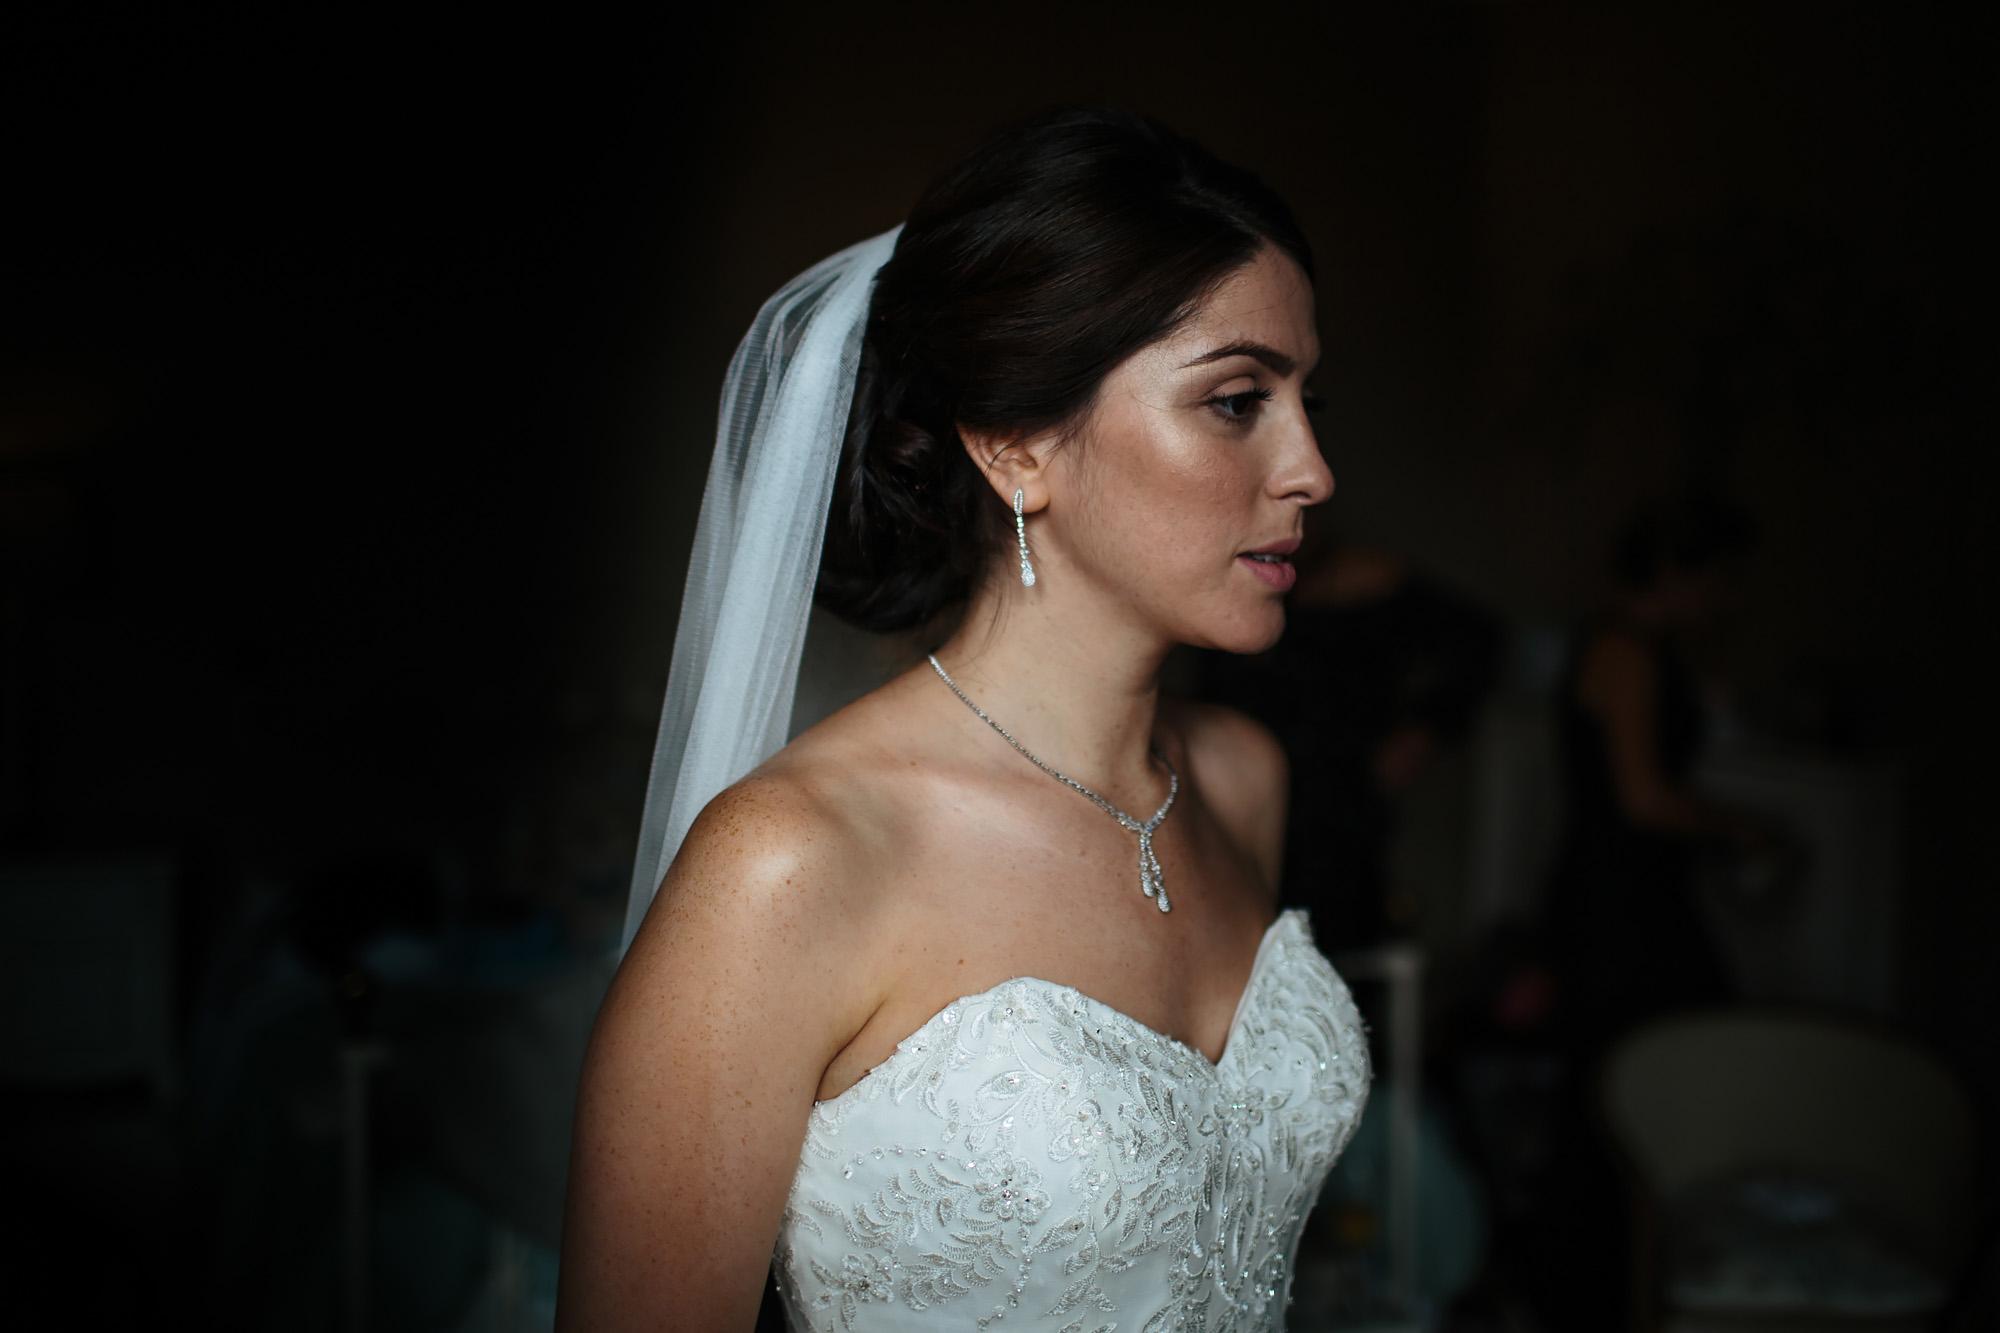 Bride portrait in natural window light